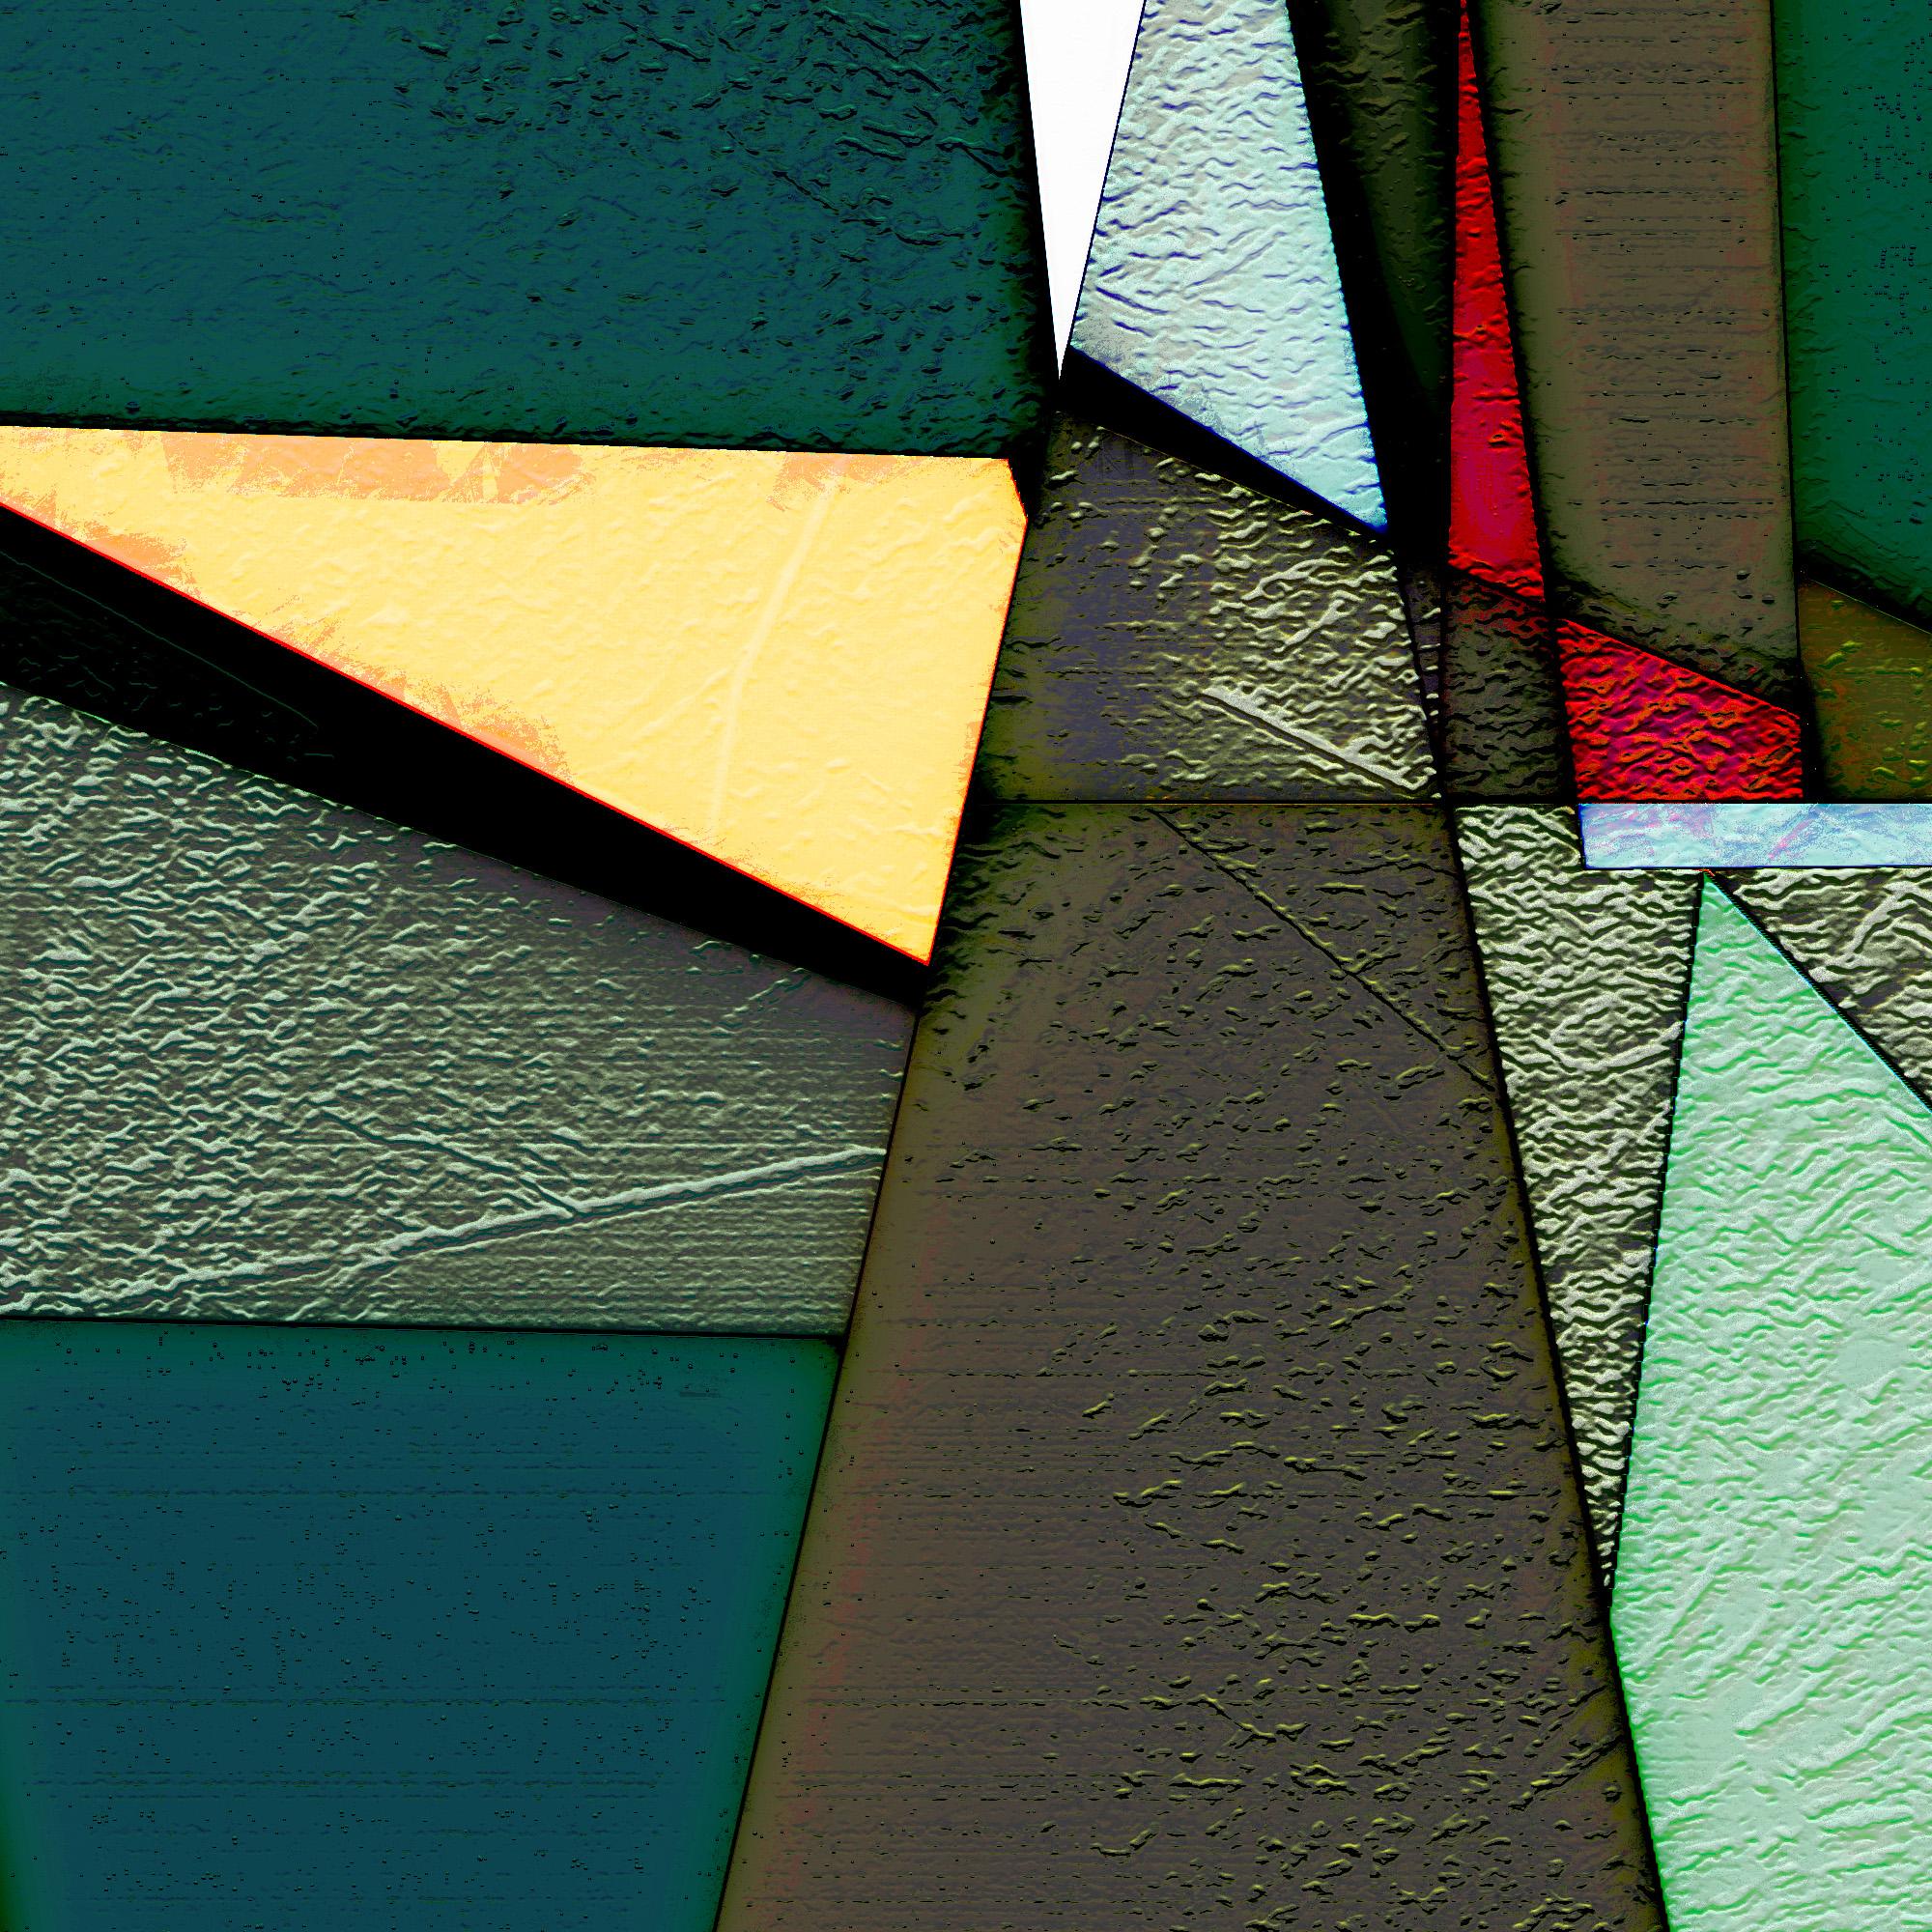 180625_My_Version_Detail2.jpg